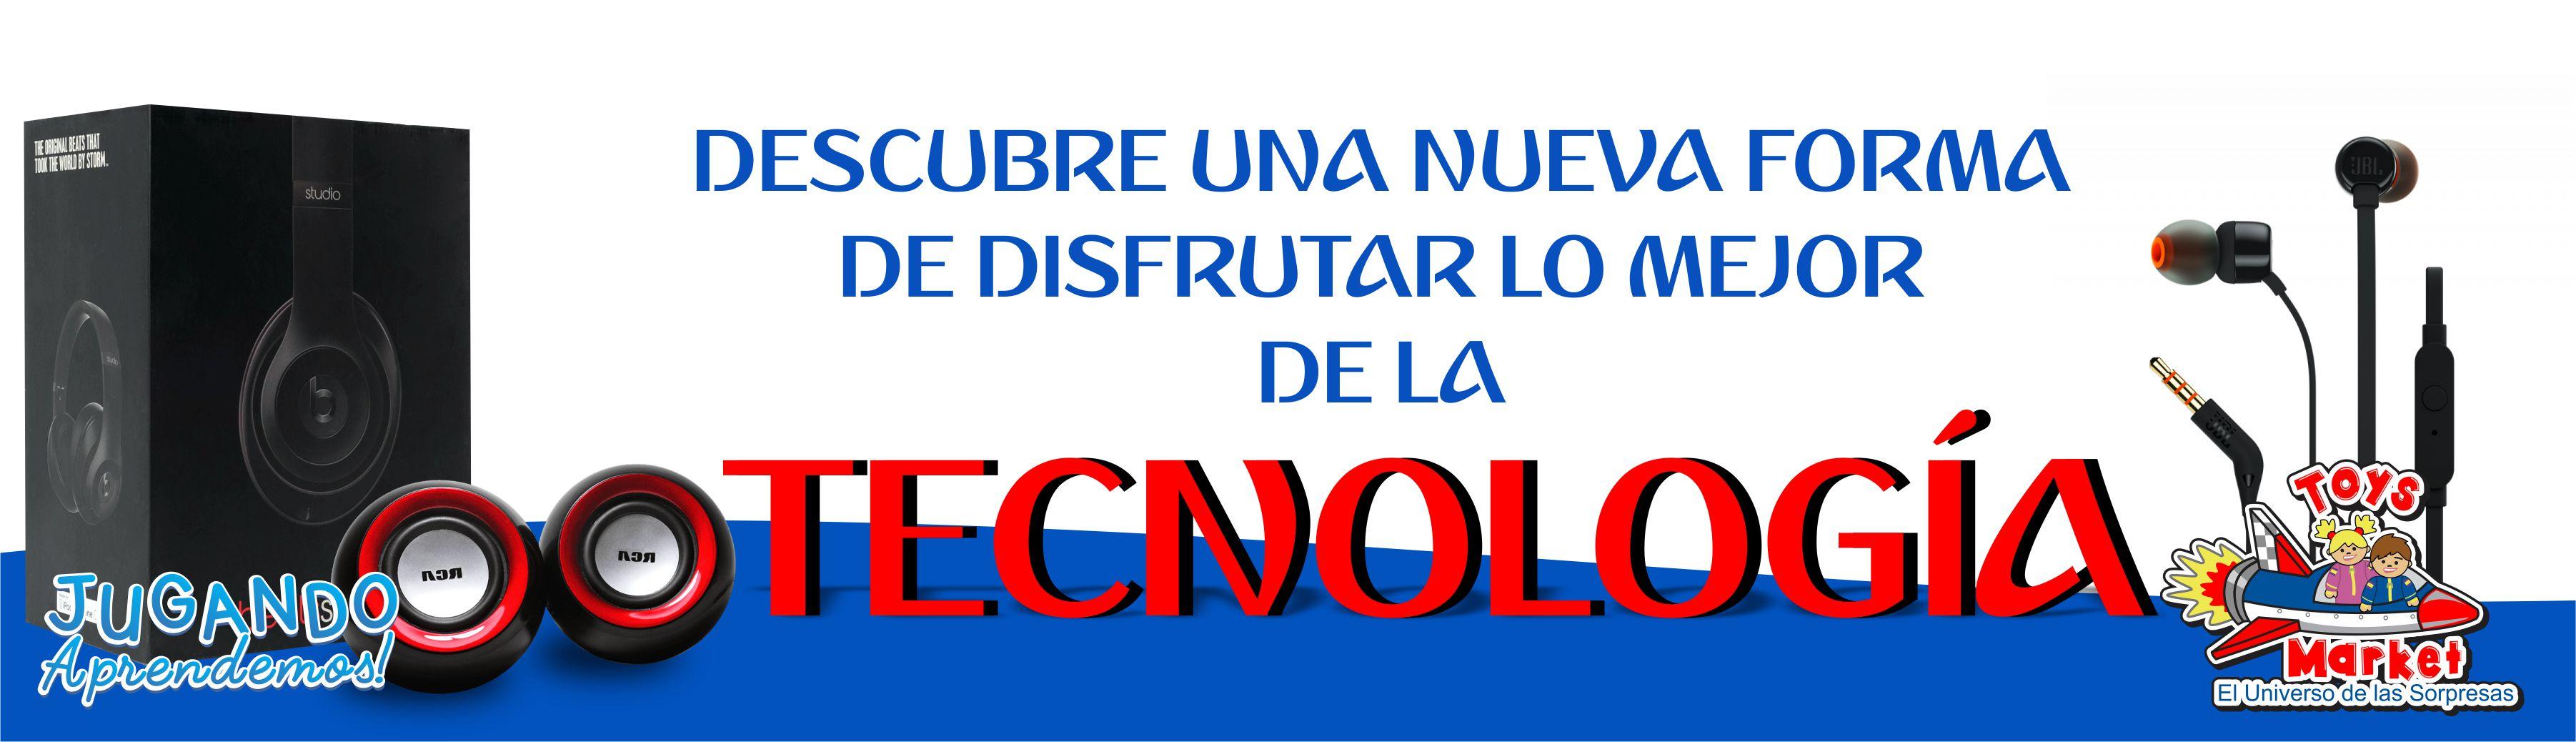 banner TECNOLOGIA 1